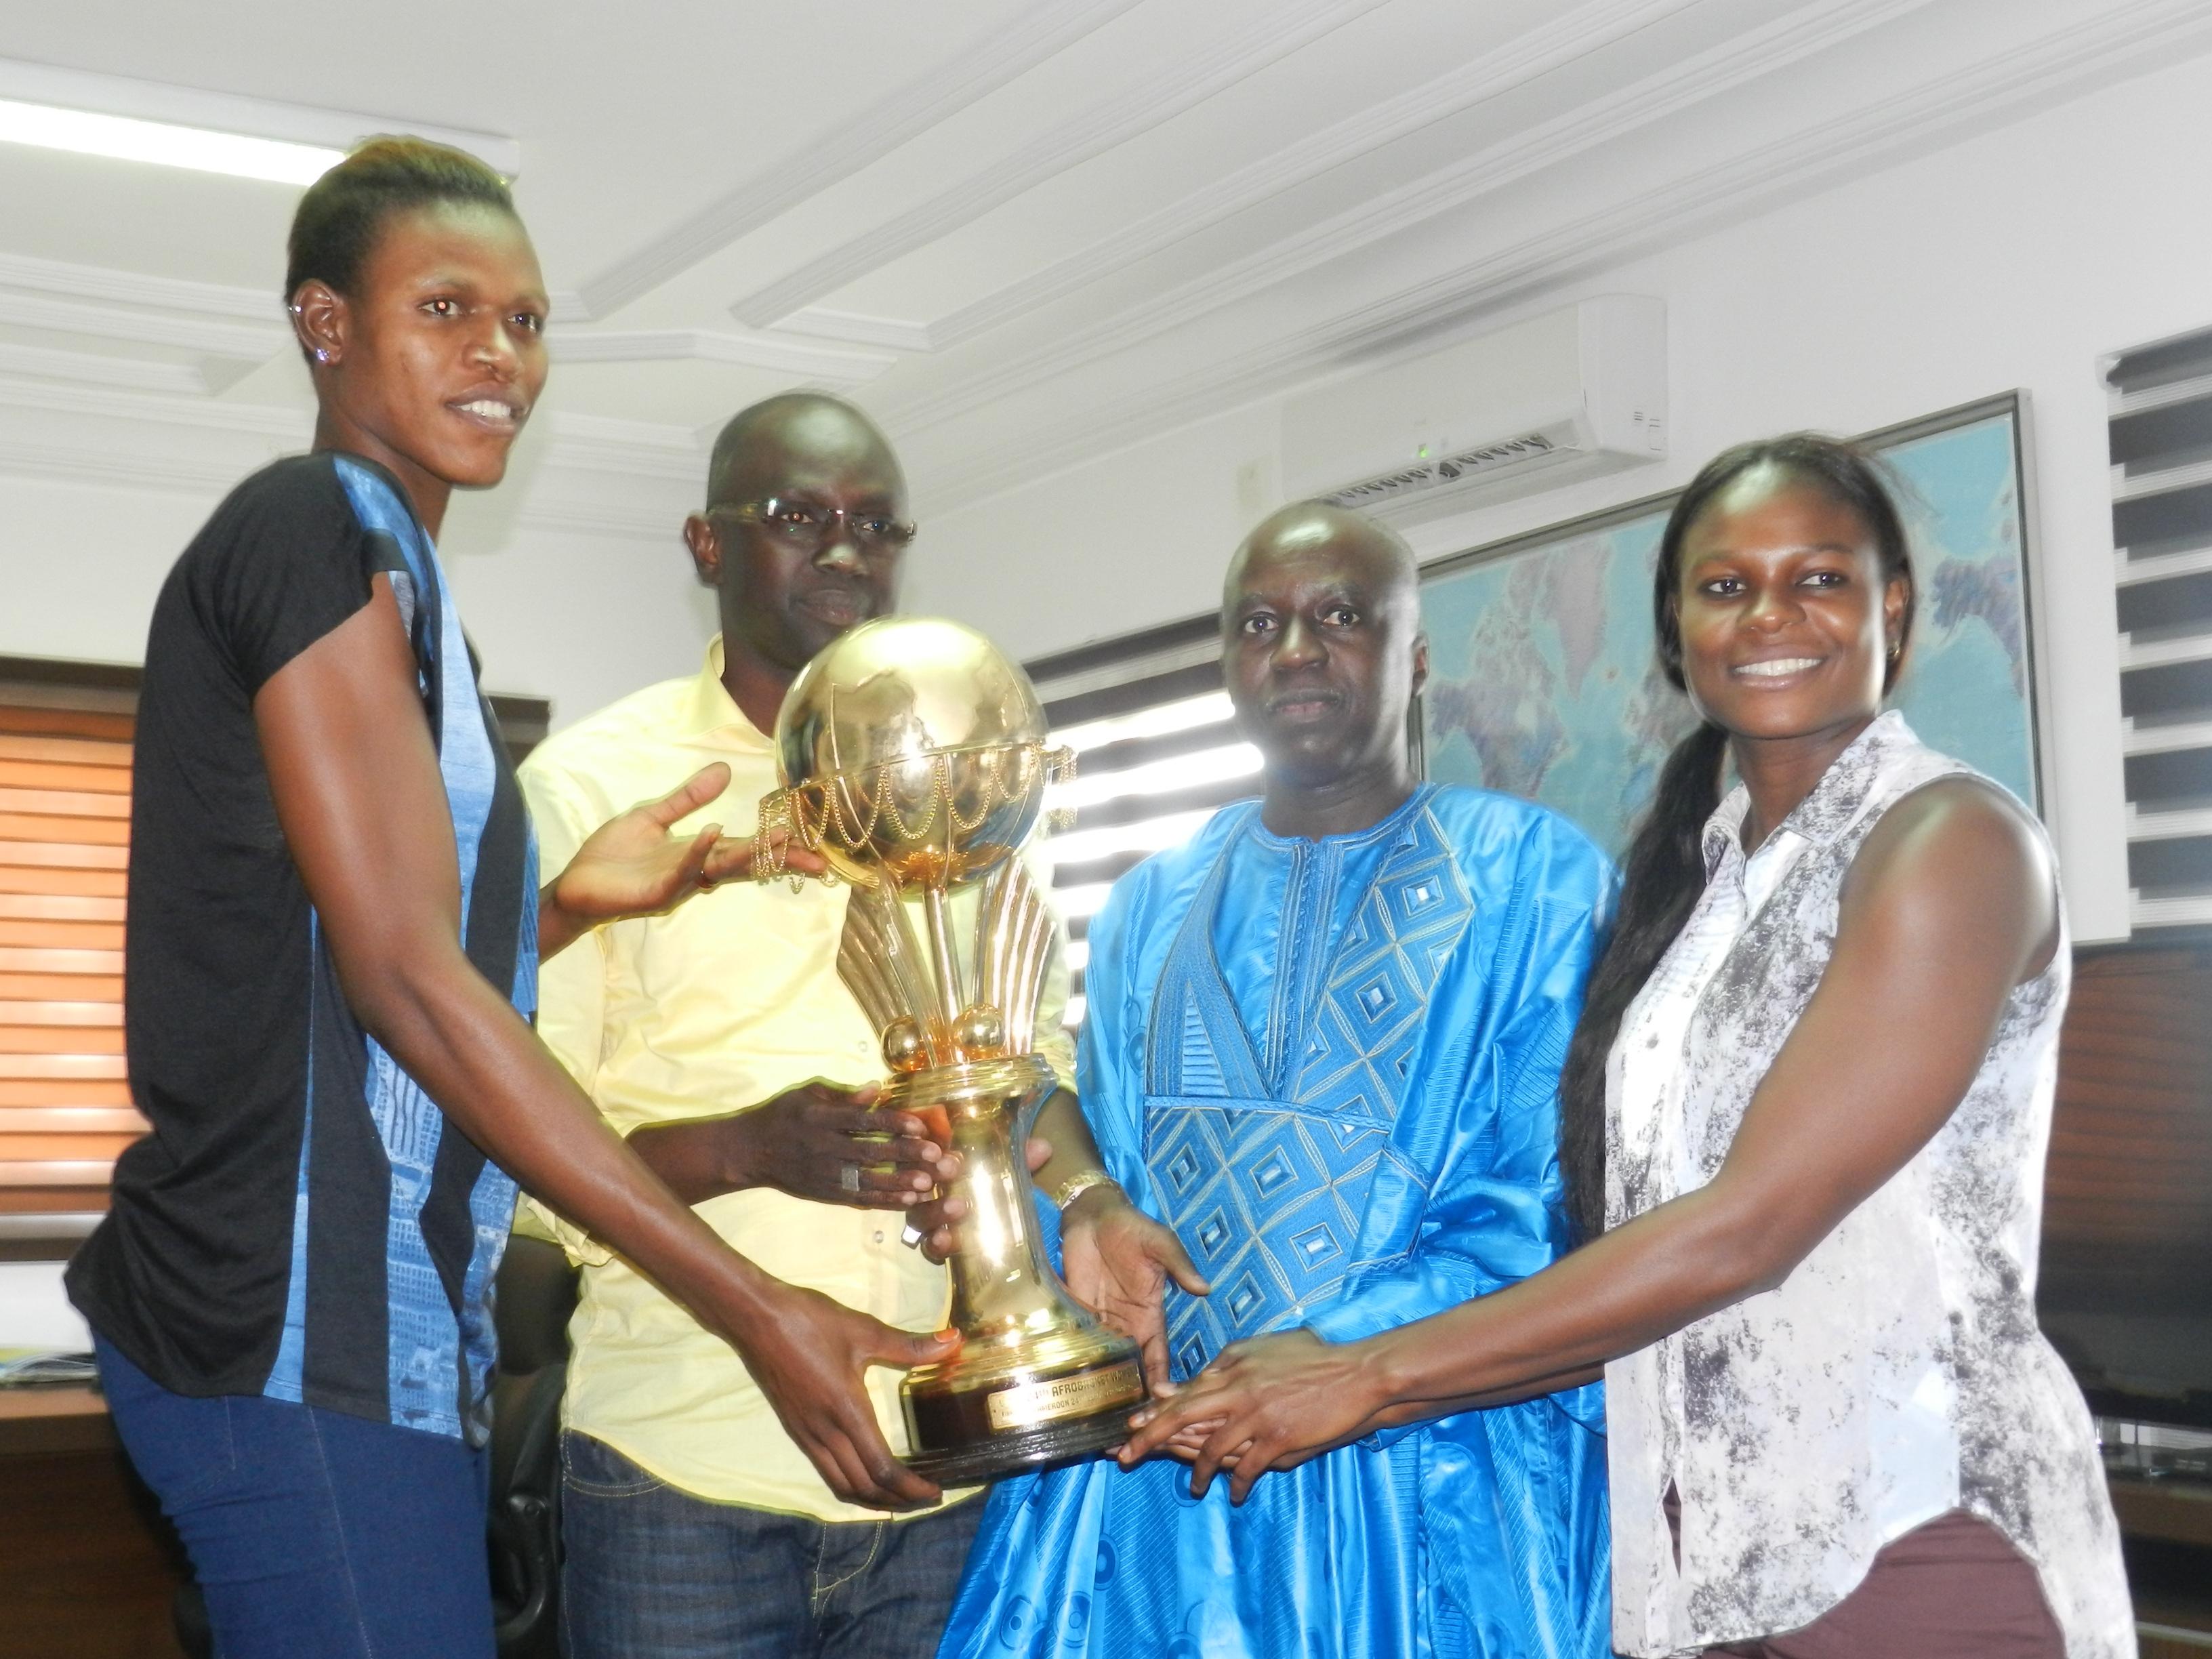 De gauche à droite: Ramata Daou, Abass Ndoye, Papa Maël Diop et Mame Diodio Diouf